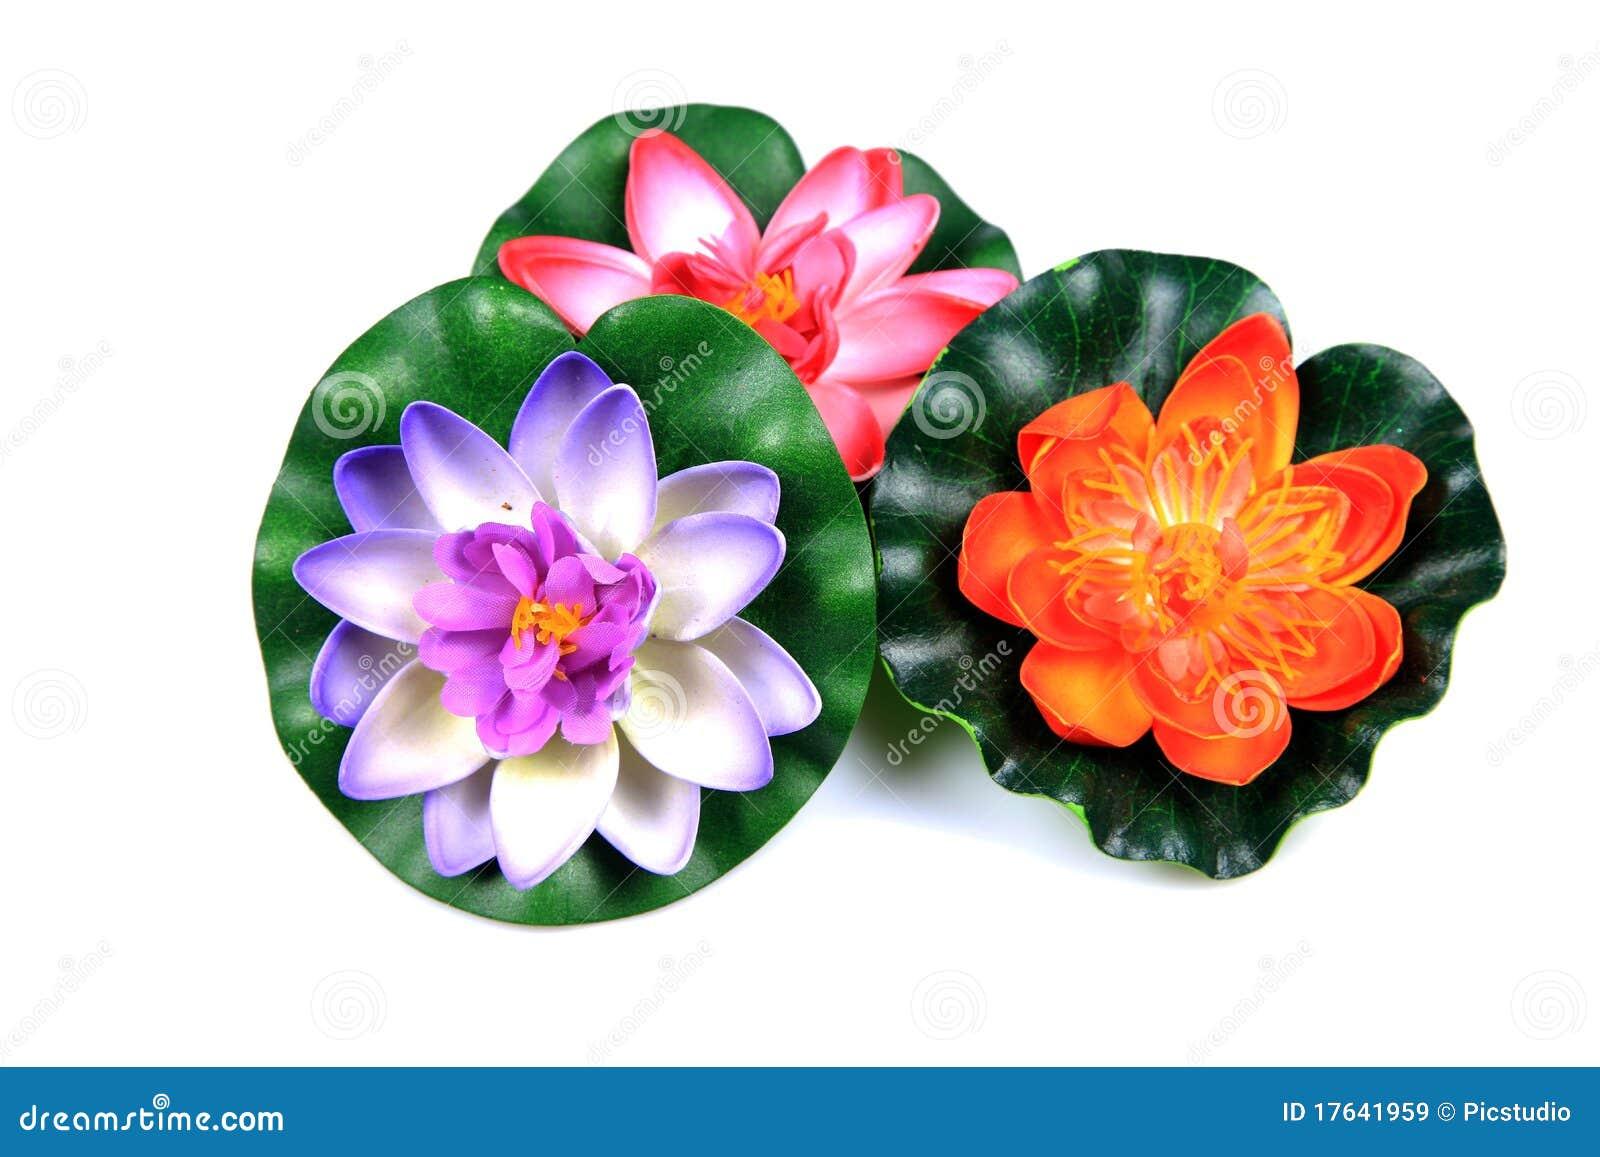 Plastic Lotus Flowers Stock Image Image Of Studio Decoration